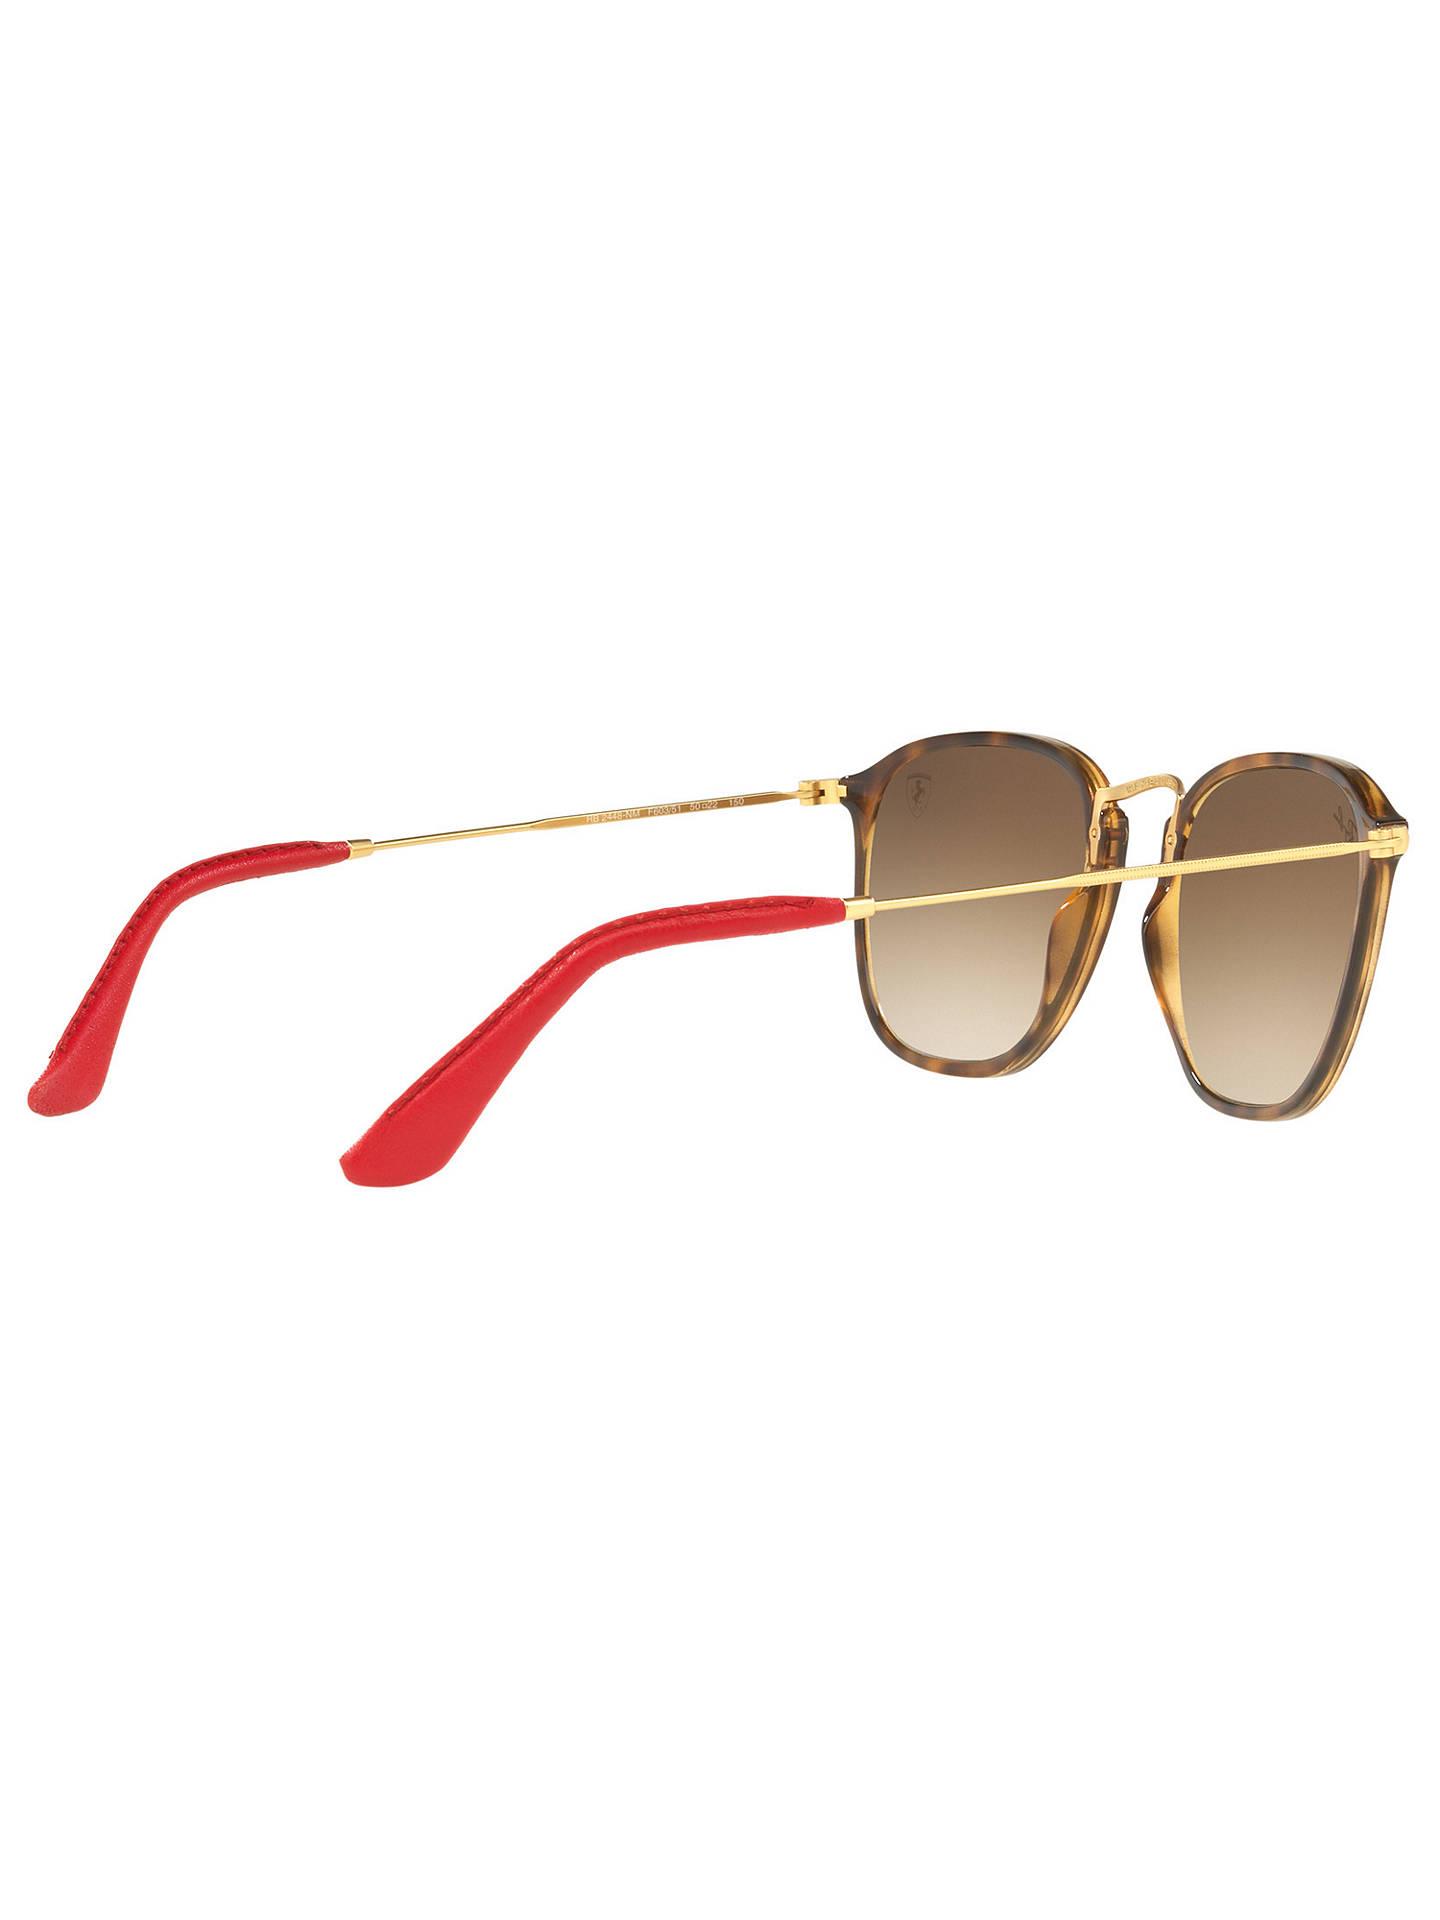 7845653b0053b Ray-Ban RB2448NM Scuderia Ferrari Square Sunglasses at John Lewis ...